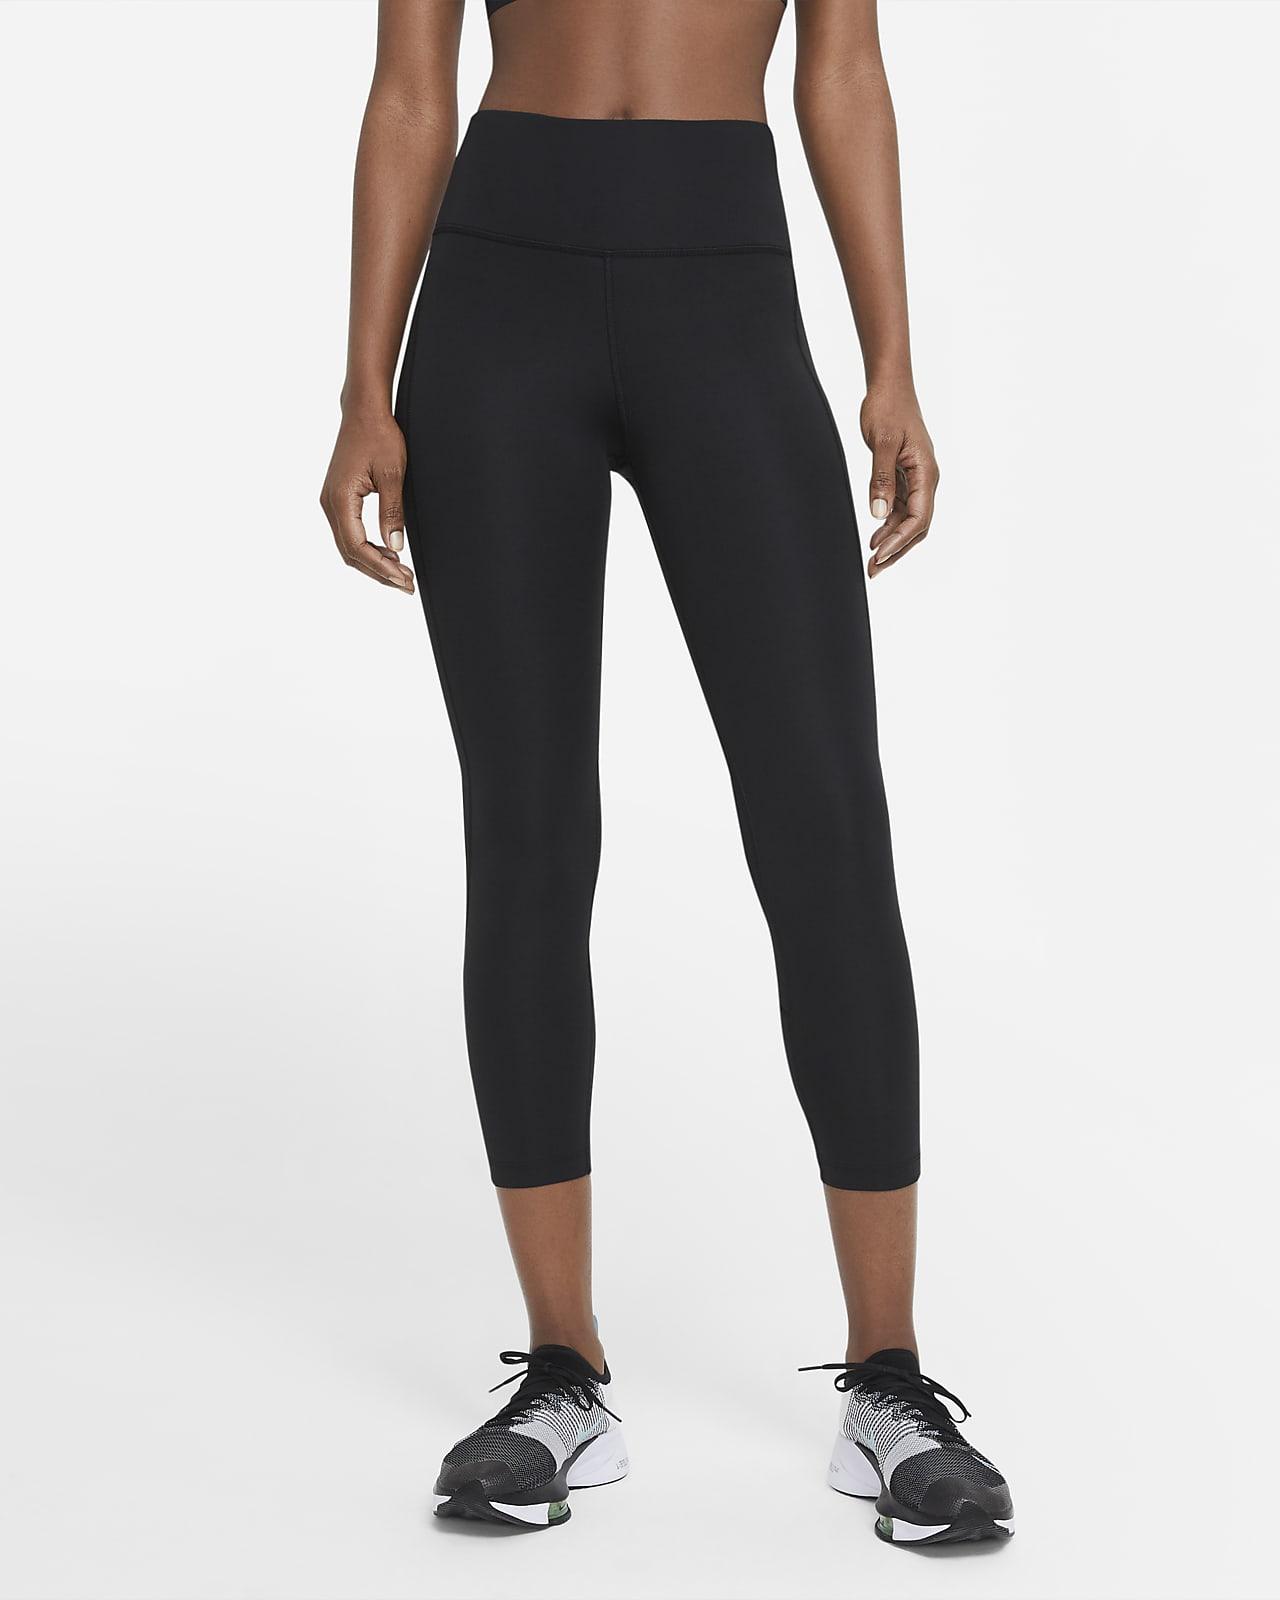 Nike Fast Women's Mid-Rise Crop Running Leggings